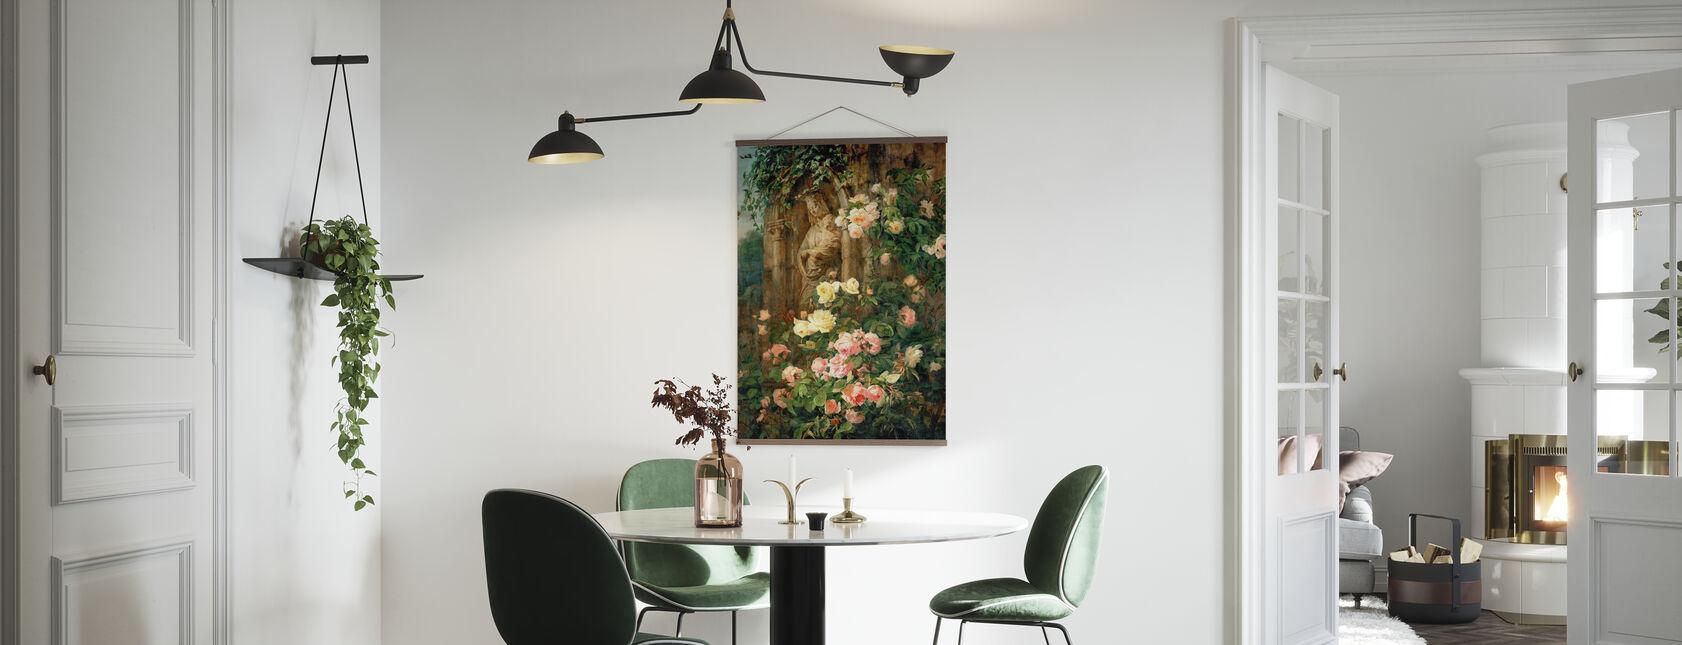 Mother Mary Rose Flower - Simon Saint Jean - Poster - Kitchen